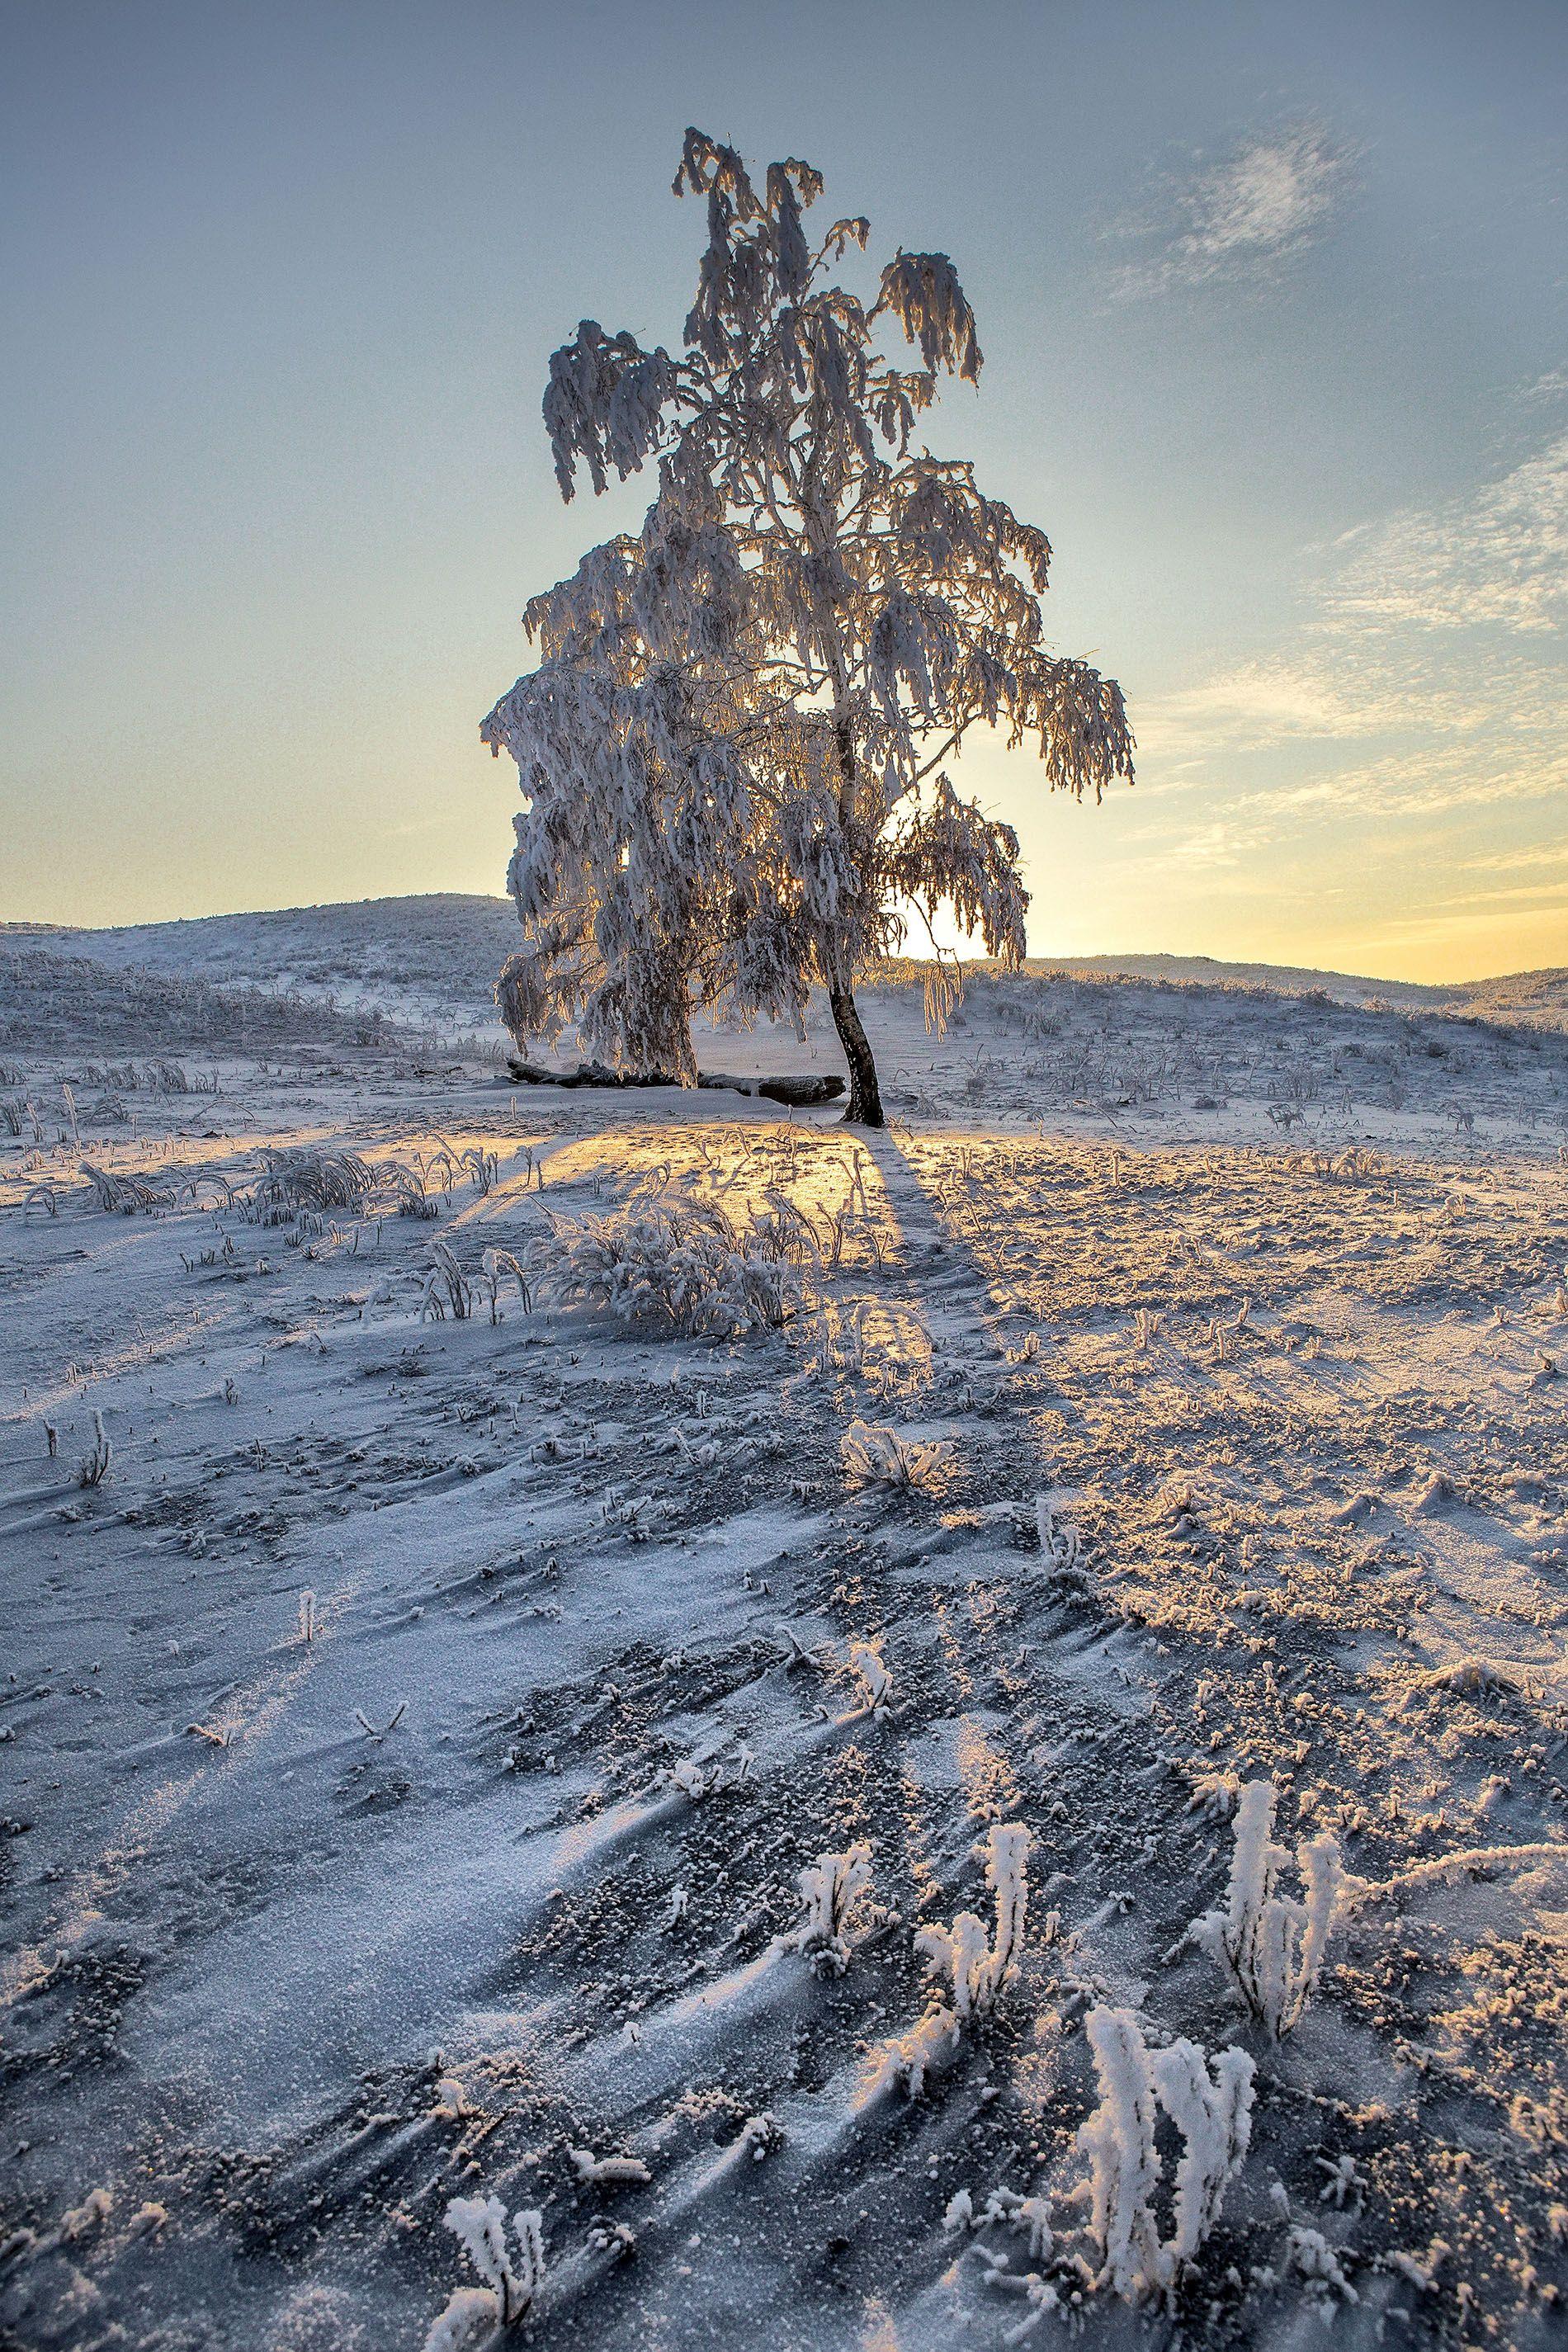 зима иней изморось дерево закат фактура снег, Качурин Алексей